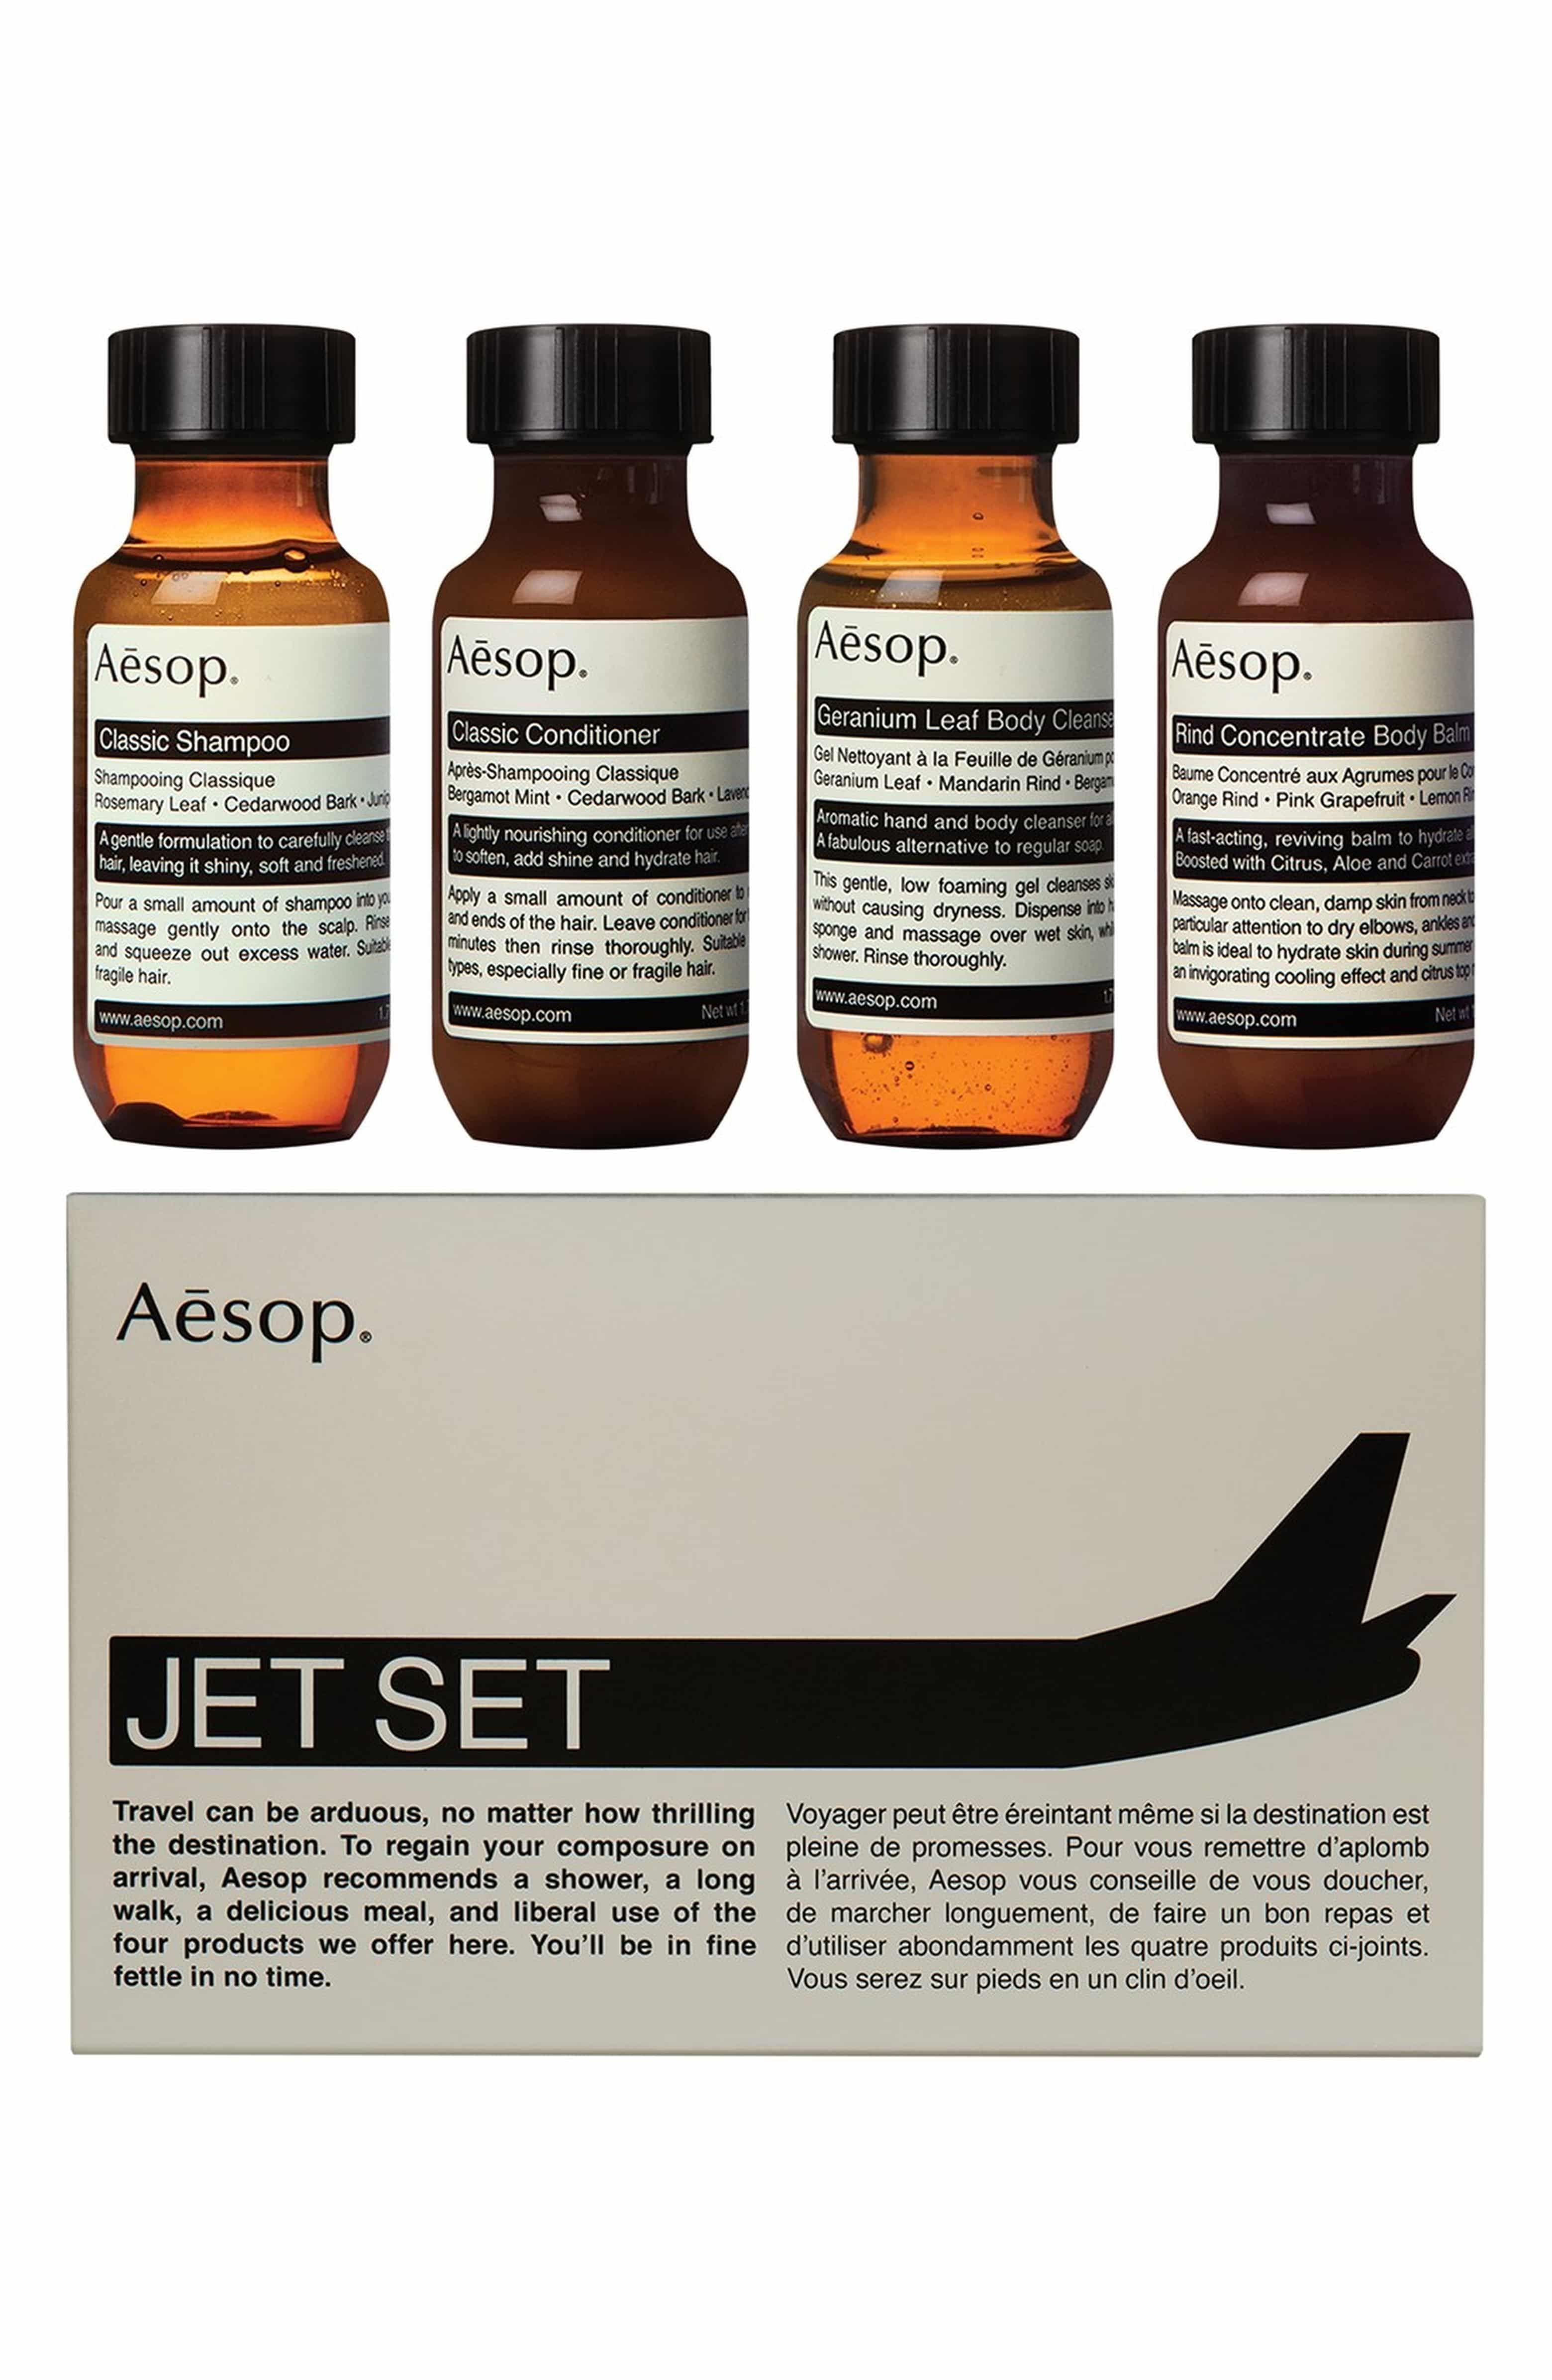 Aesop jet set travel kit jet set aesop travel size